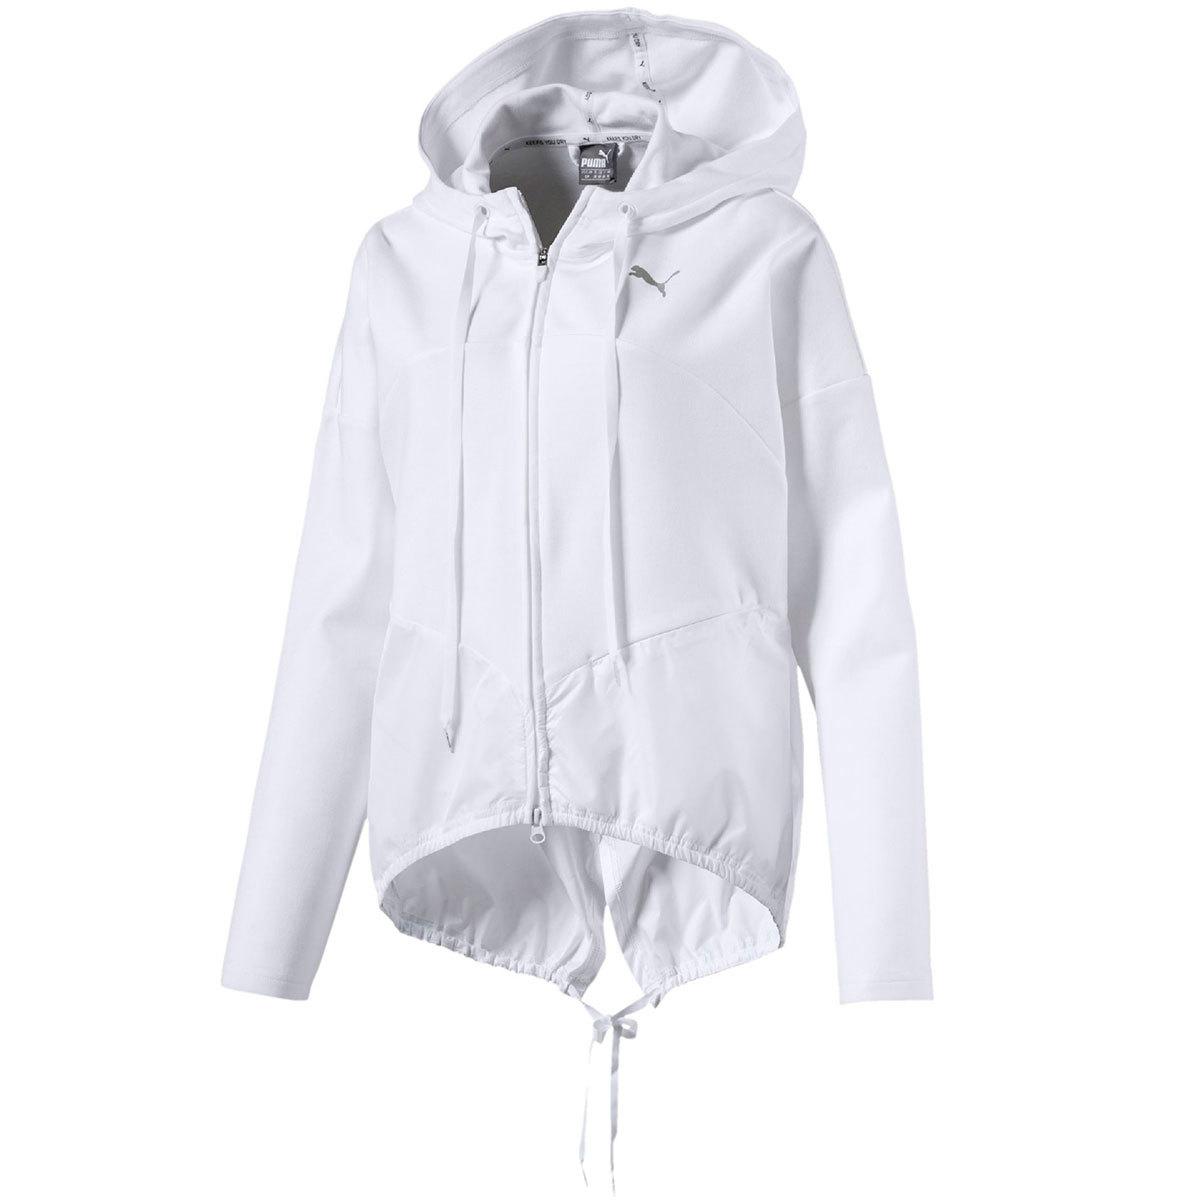 Puma Women's Transition Full-Zip Hoodie - White, L